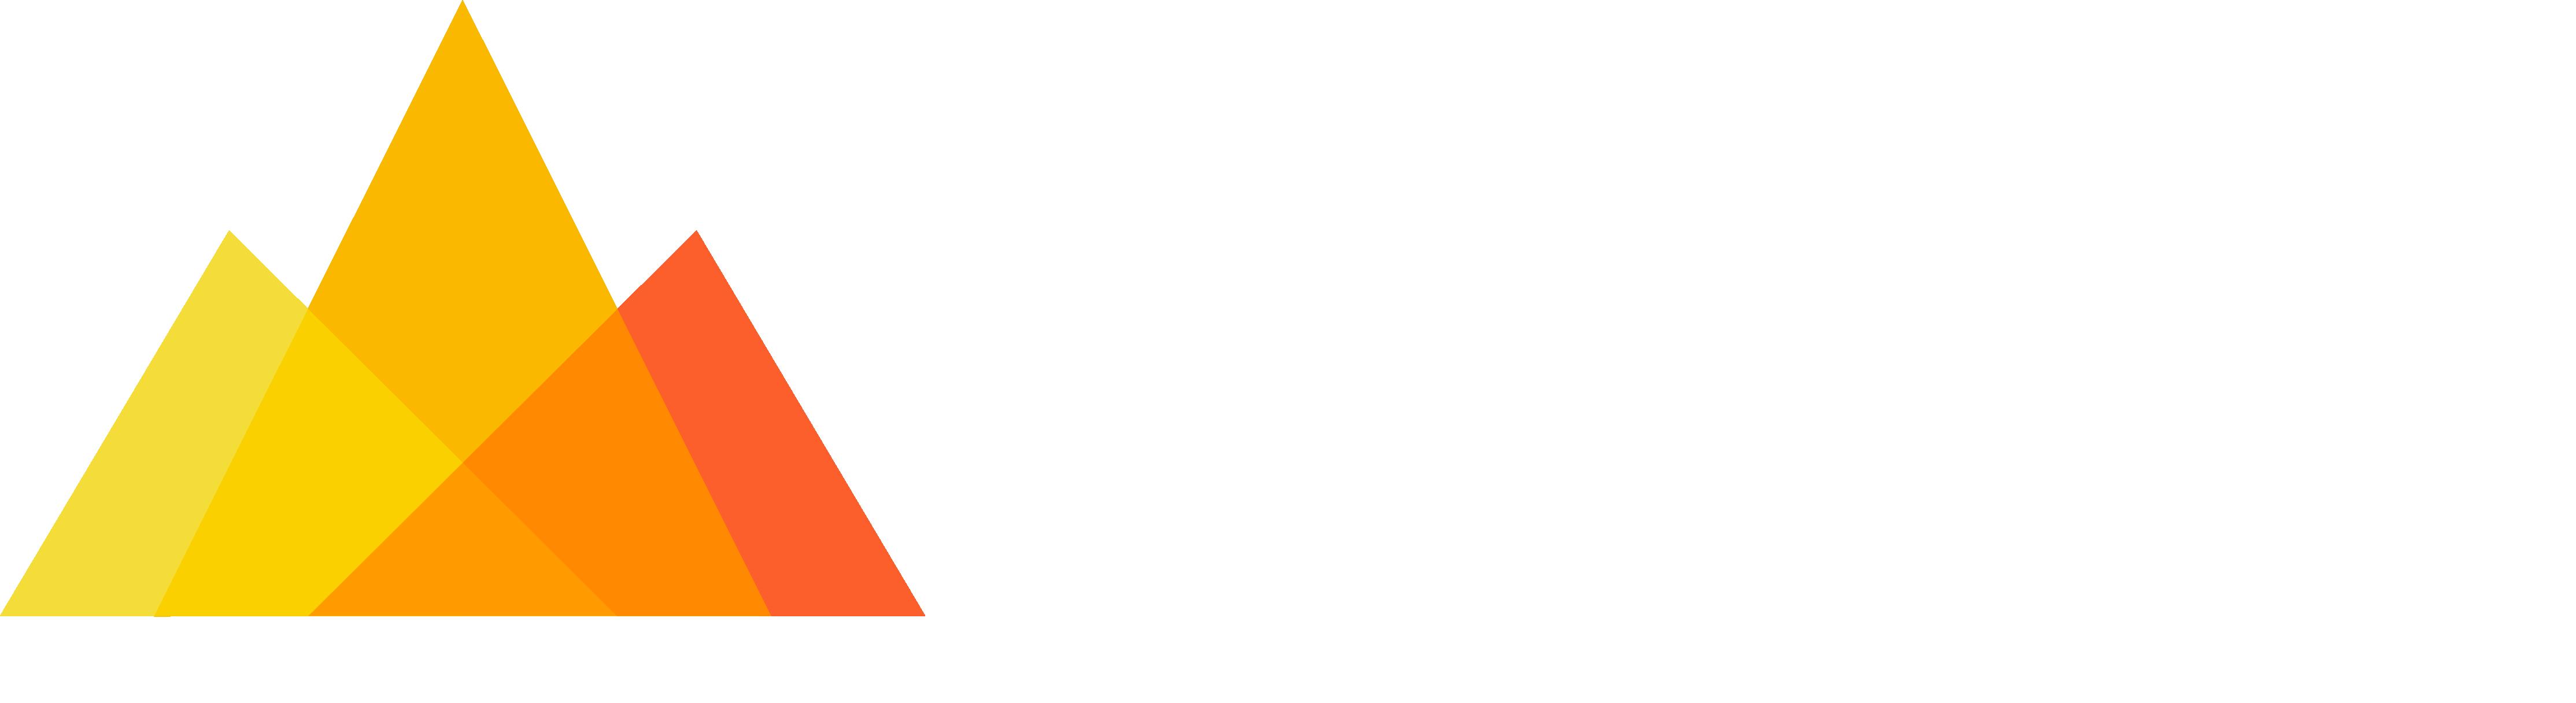 Truelytics-White-Hz-2018-1